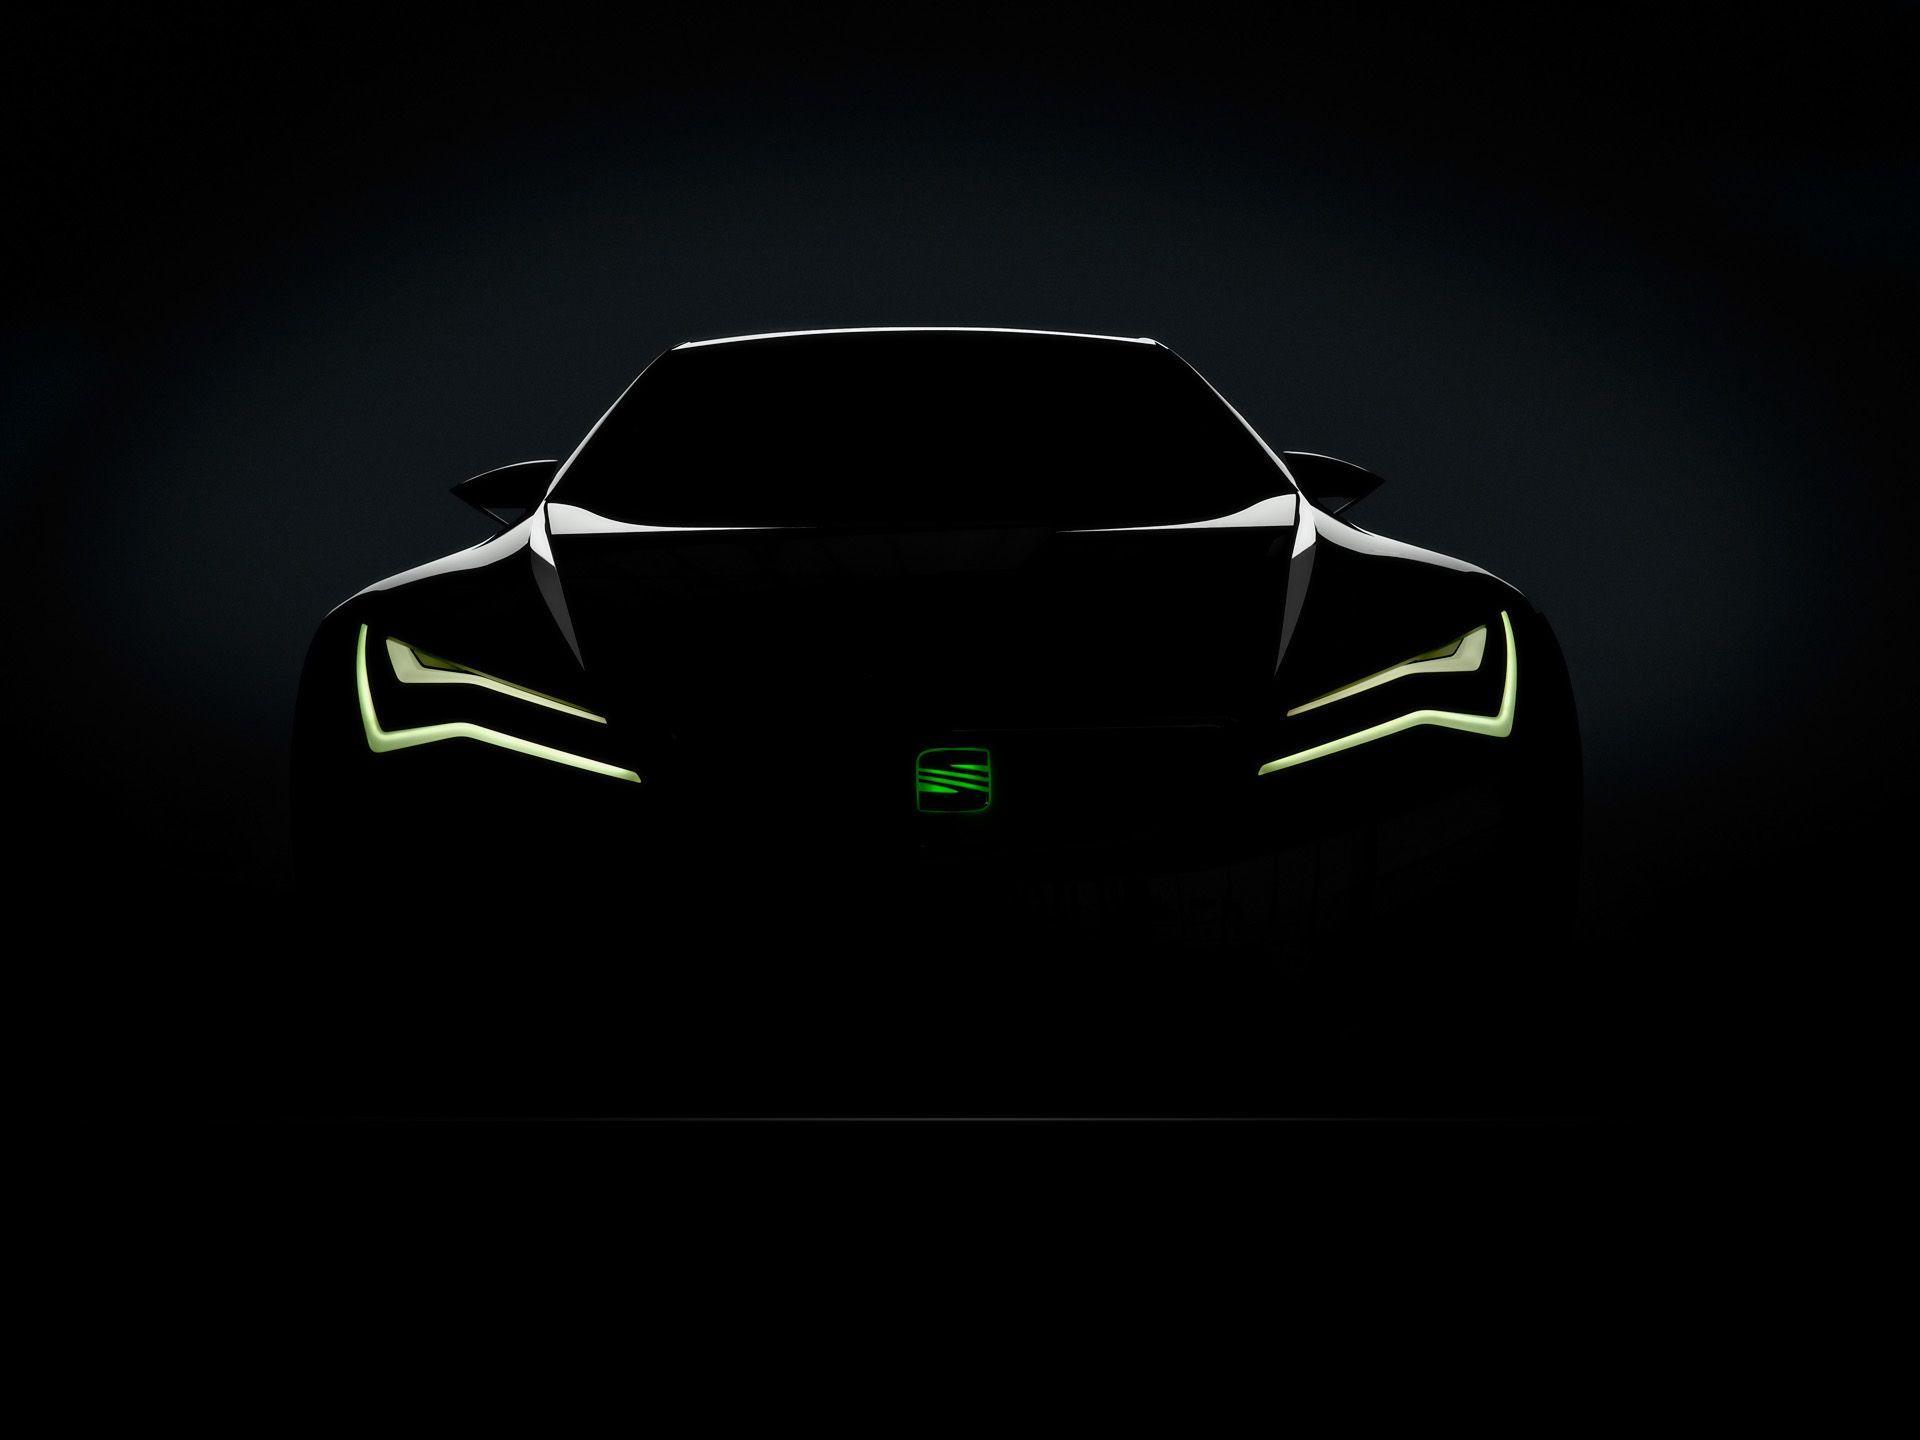 Lamborghini Led Headlights Wallpapers Wallpaper Cave